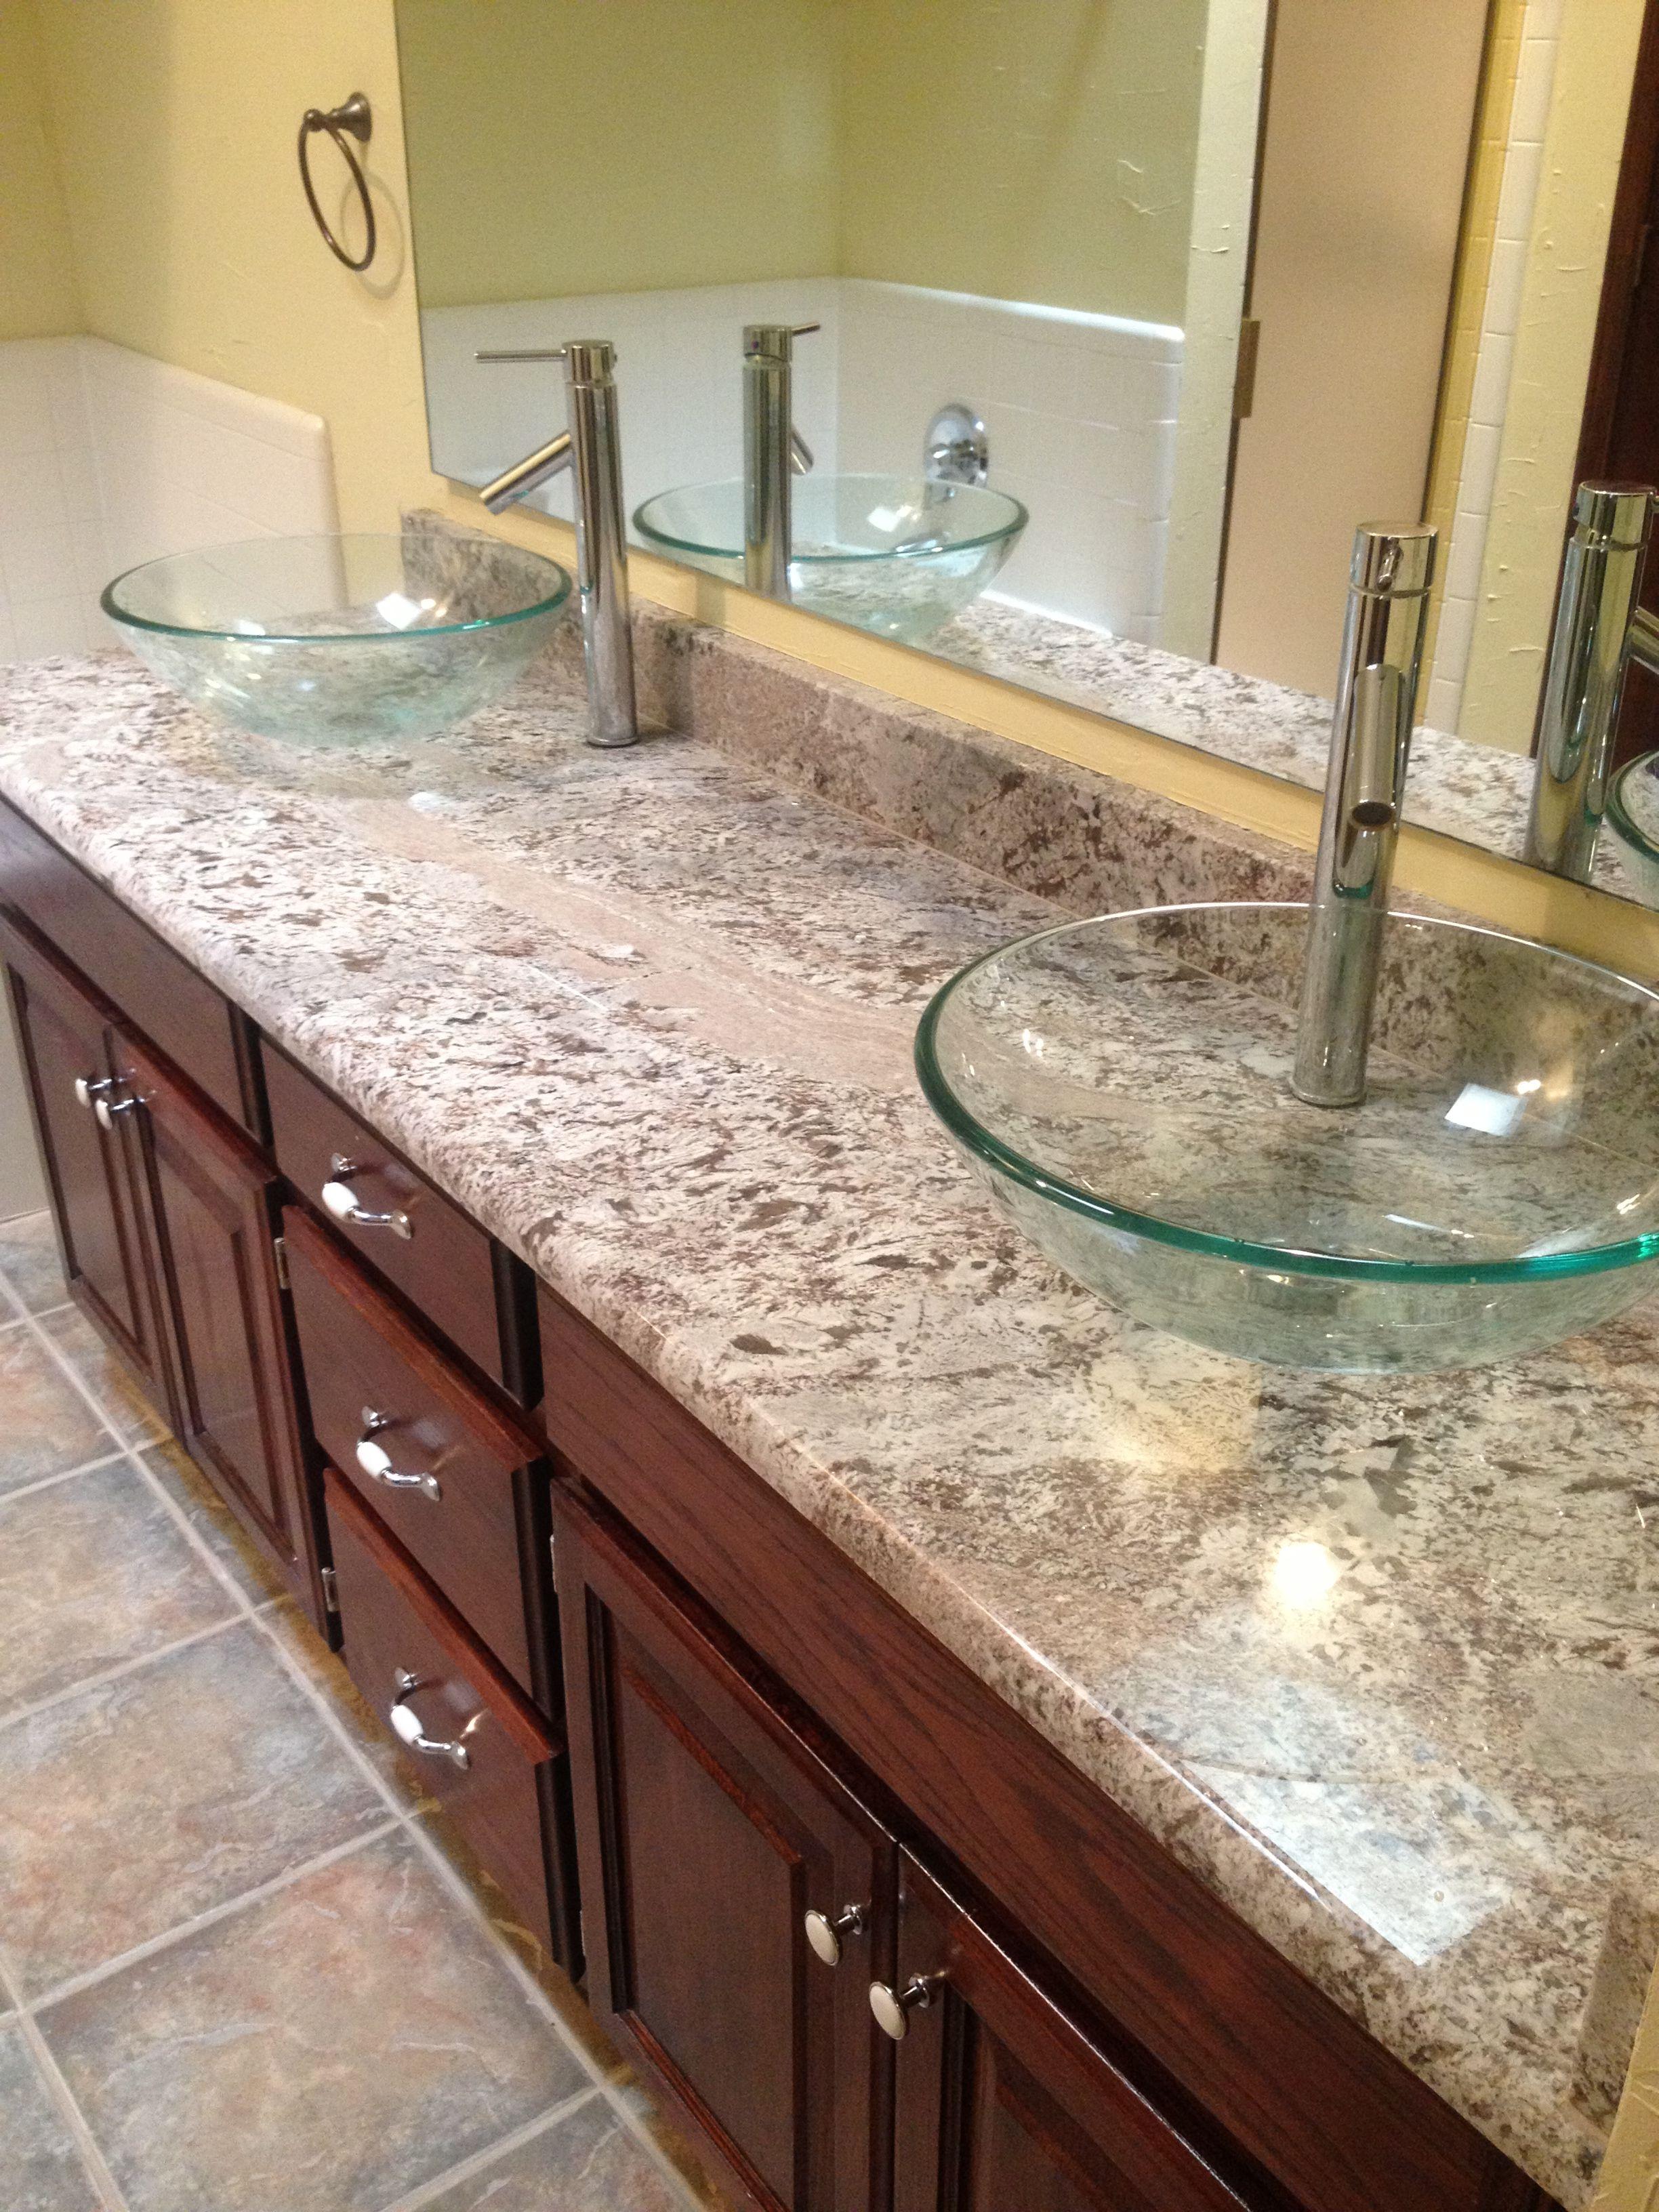 Bathroom Countertop Sinks Amp Faucets Idea